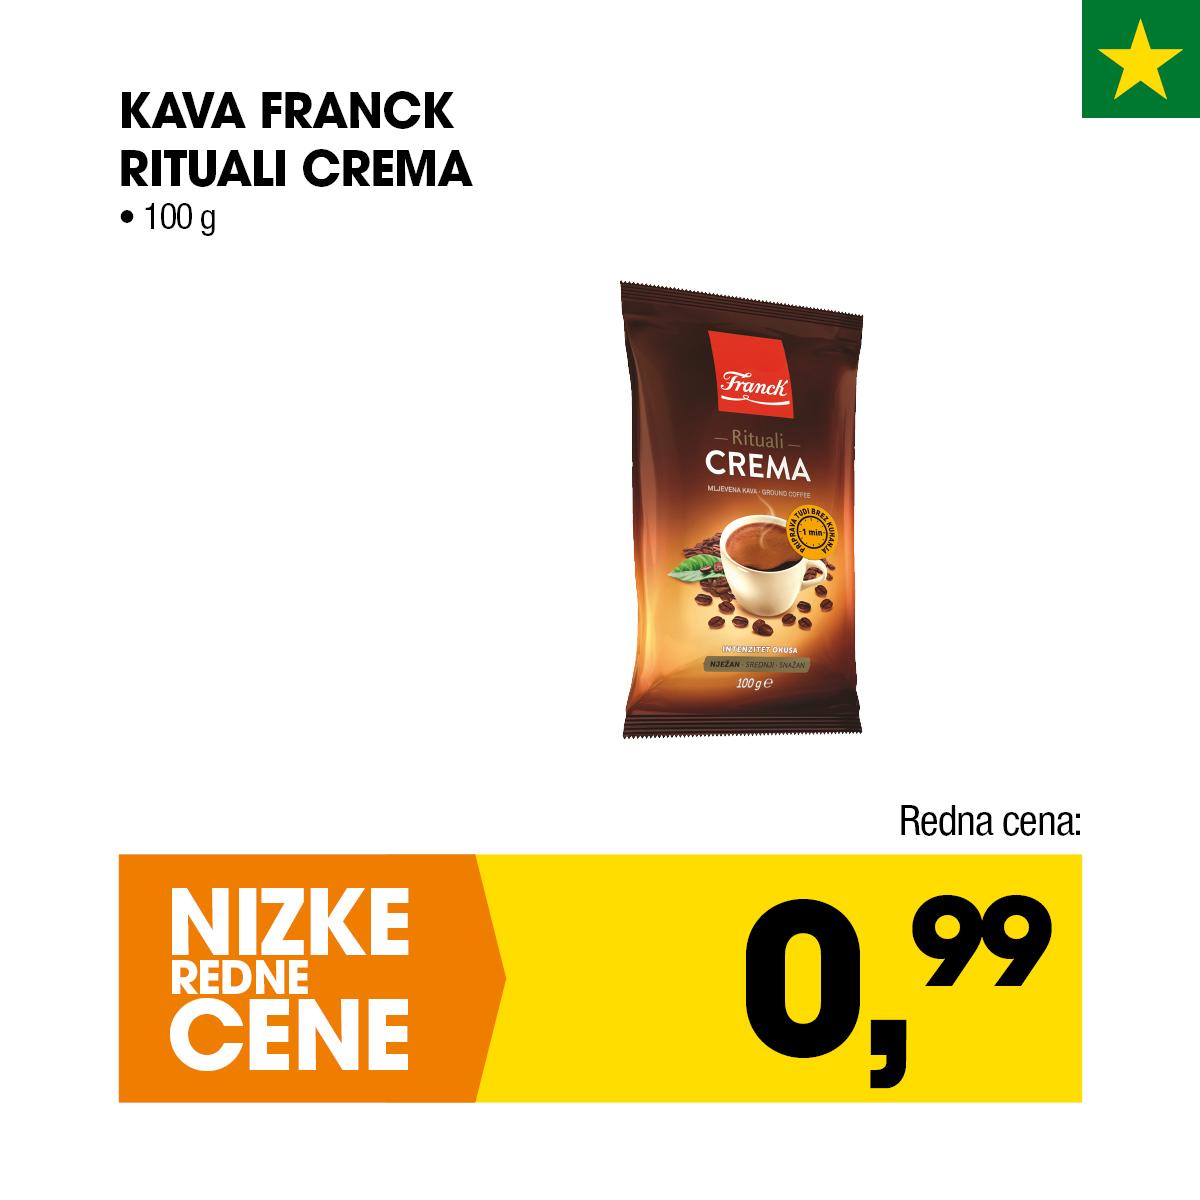 Nizke cene - Kava Franck Rituali Crema